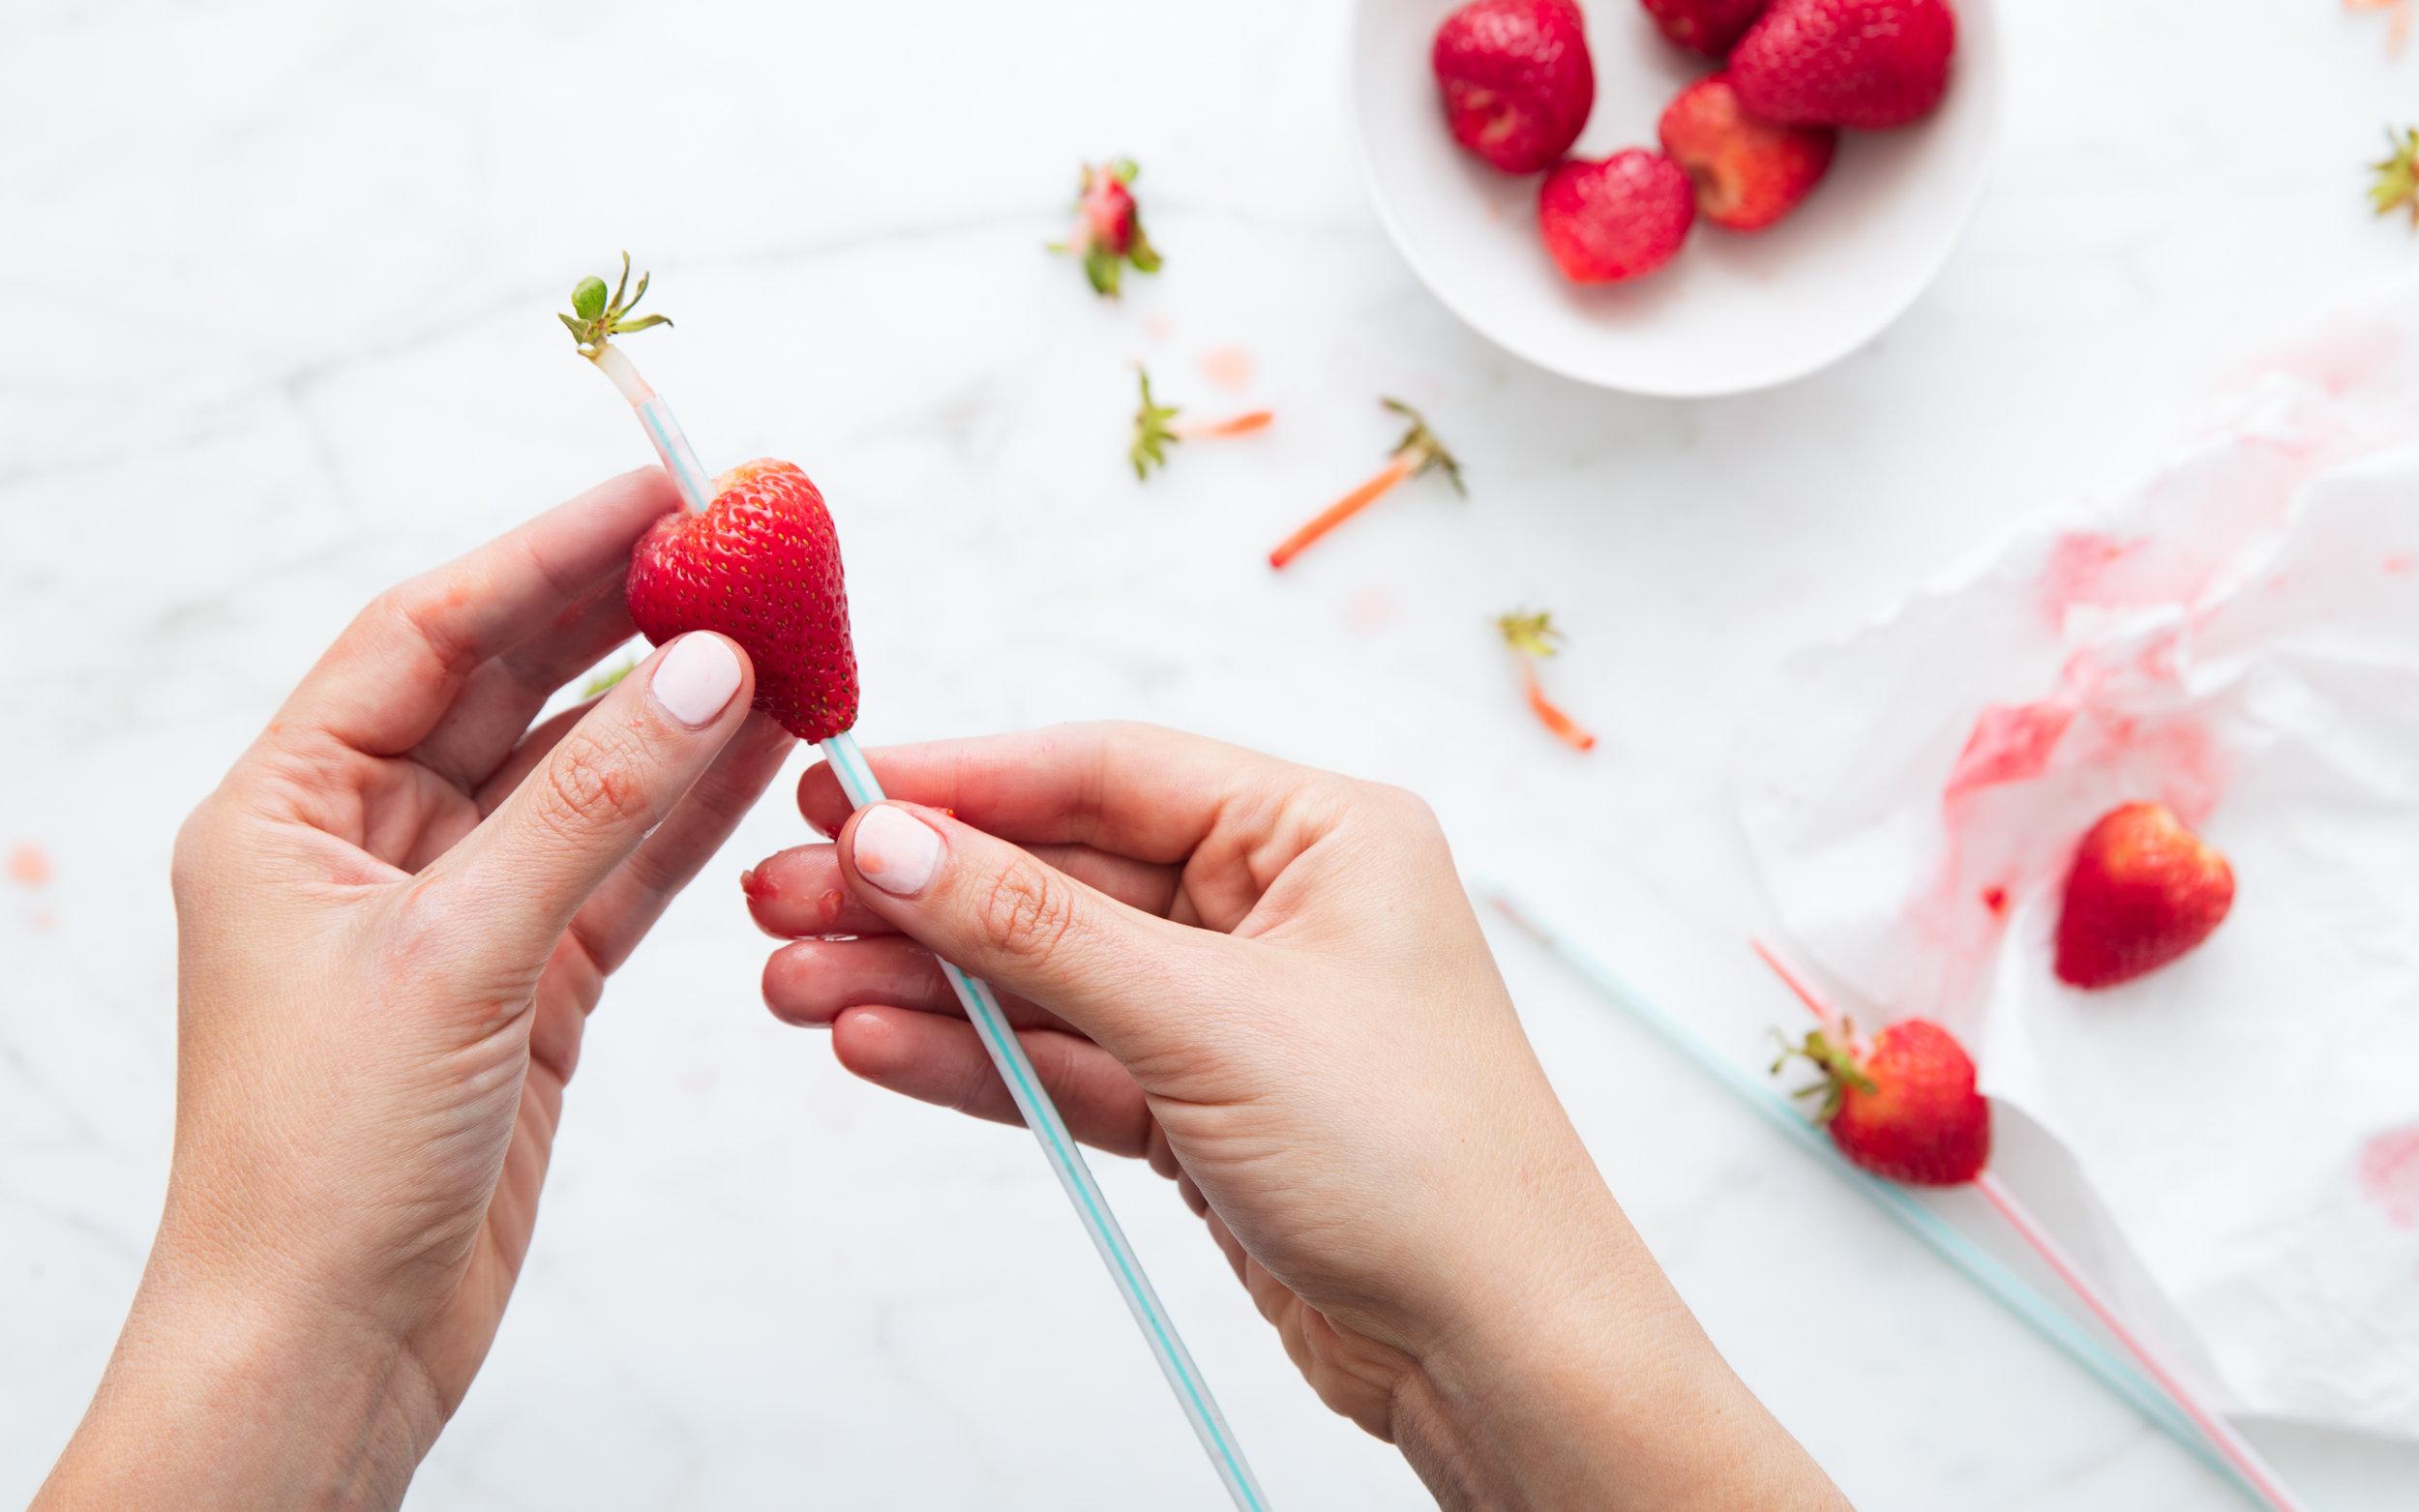 how-to-prep-strawberries-good-eggs.jpg